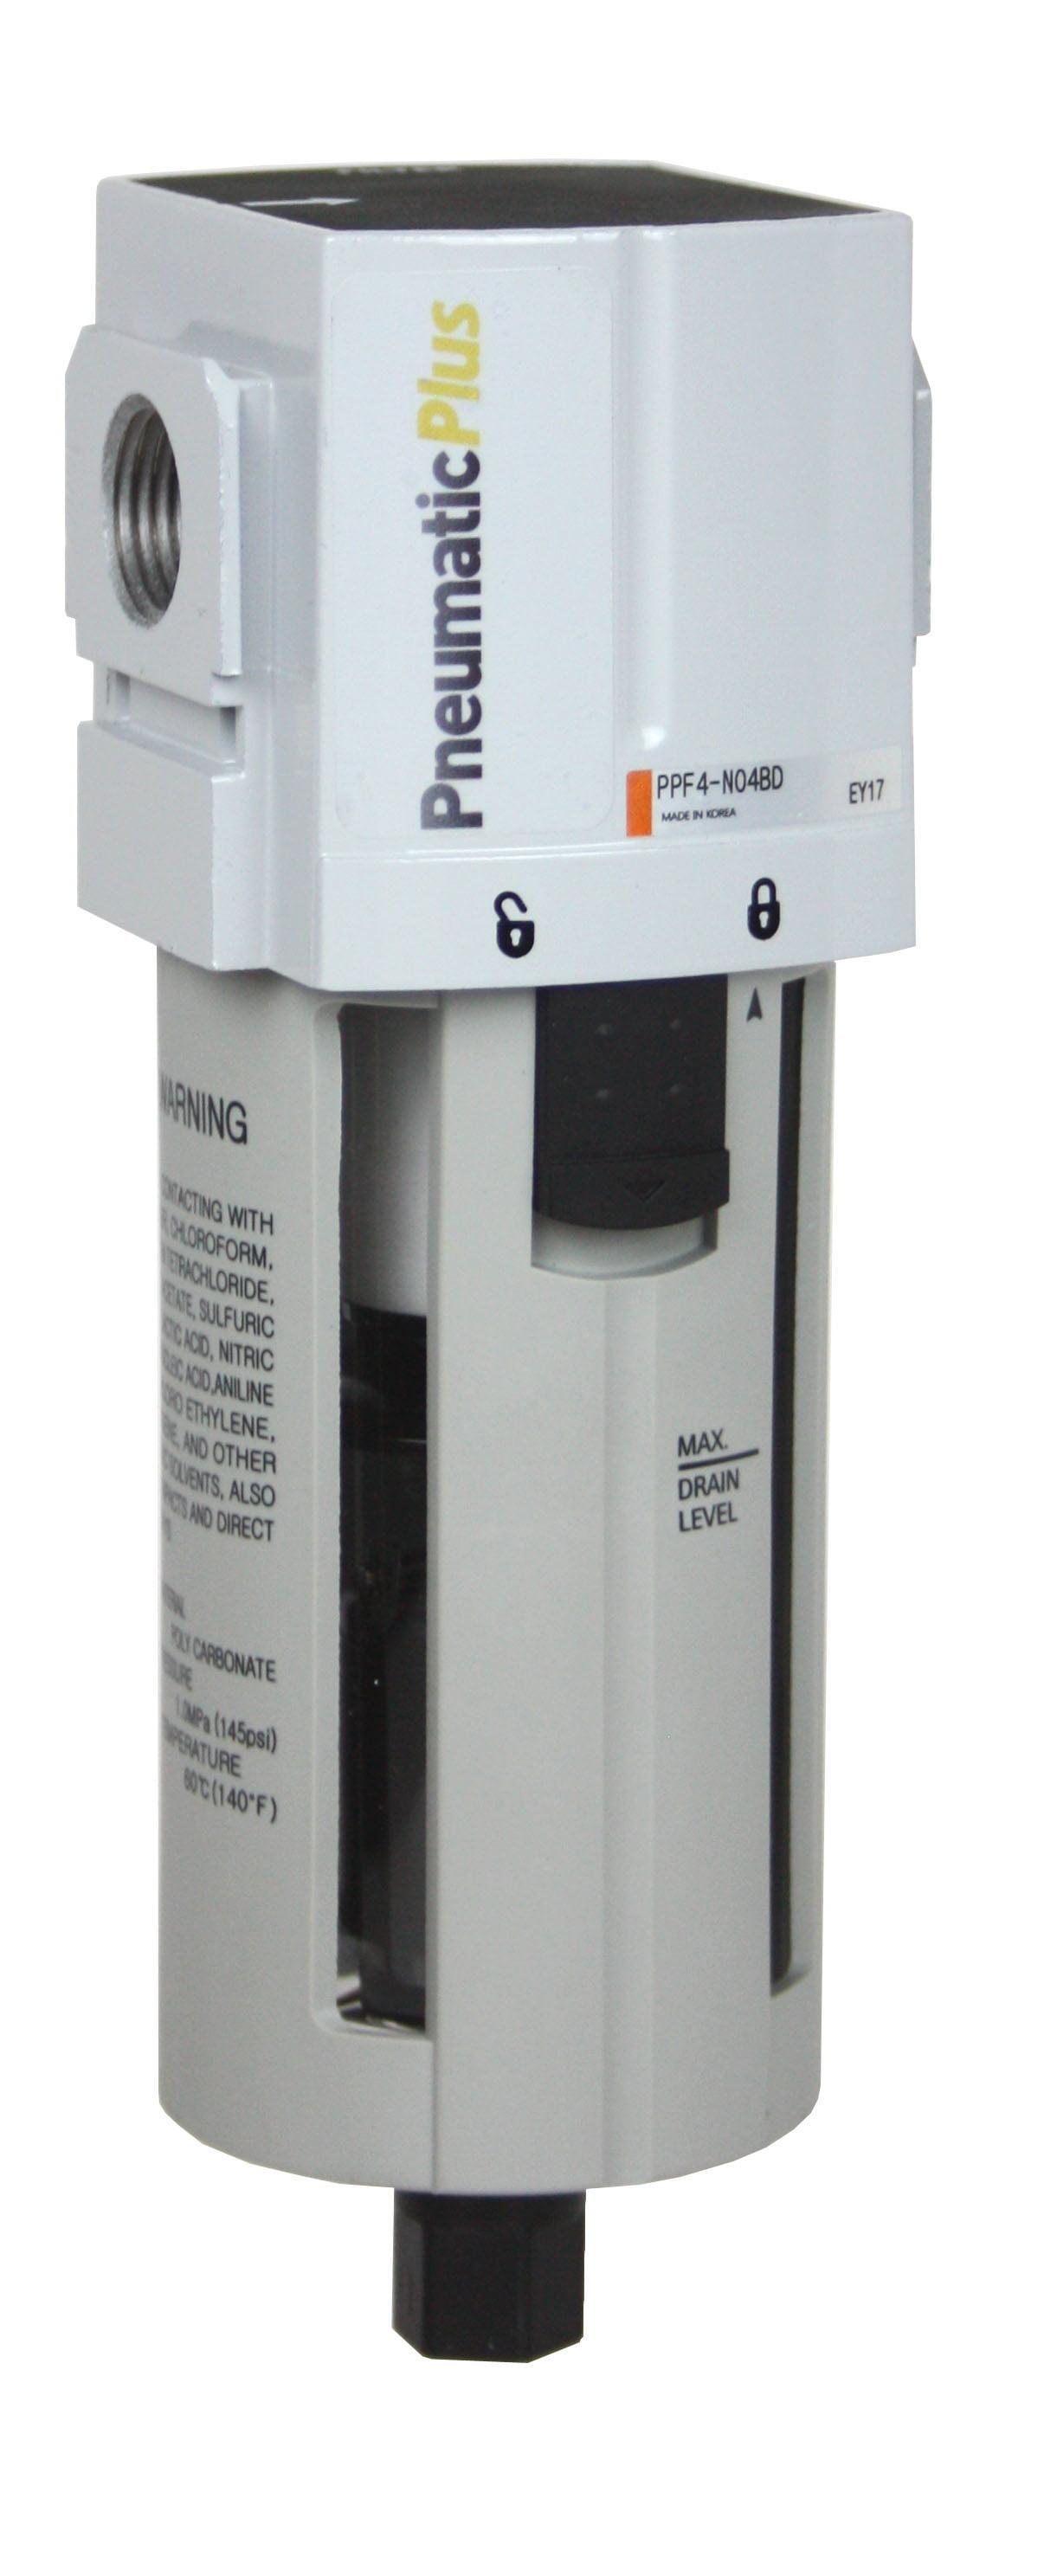 PneumaticPlus PPF2-N02B Miniature Compressed Air Particulate Filter 1//4 NPT Bracket Manual Drain 5 Micron Poly Bowl